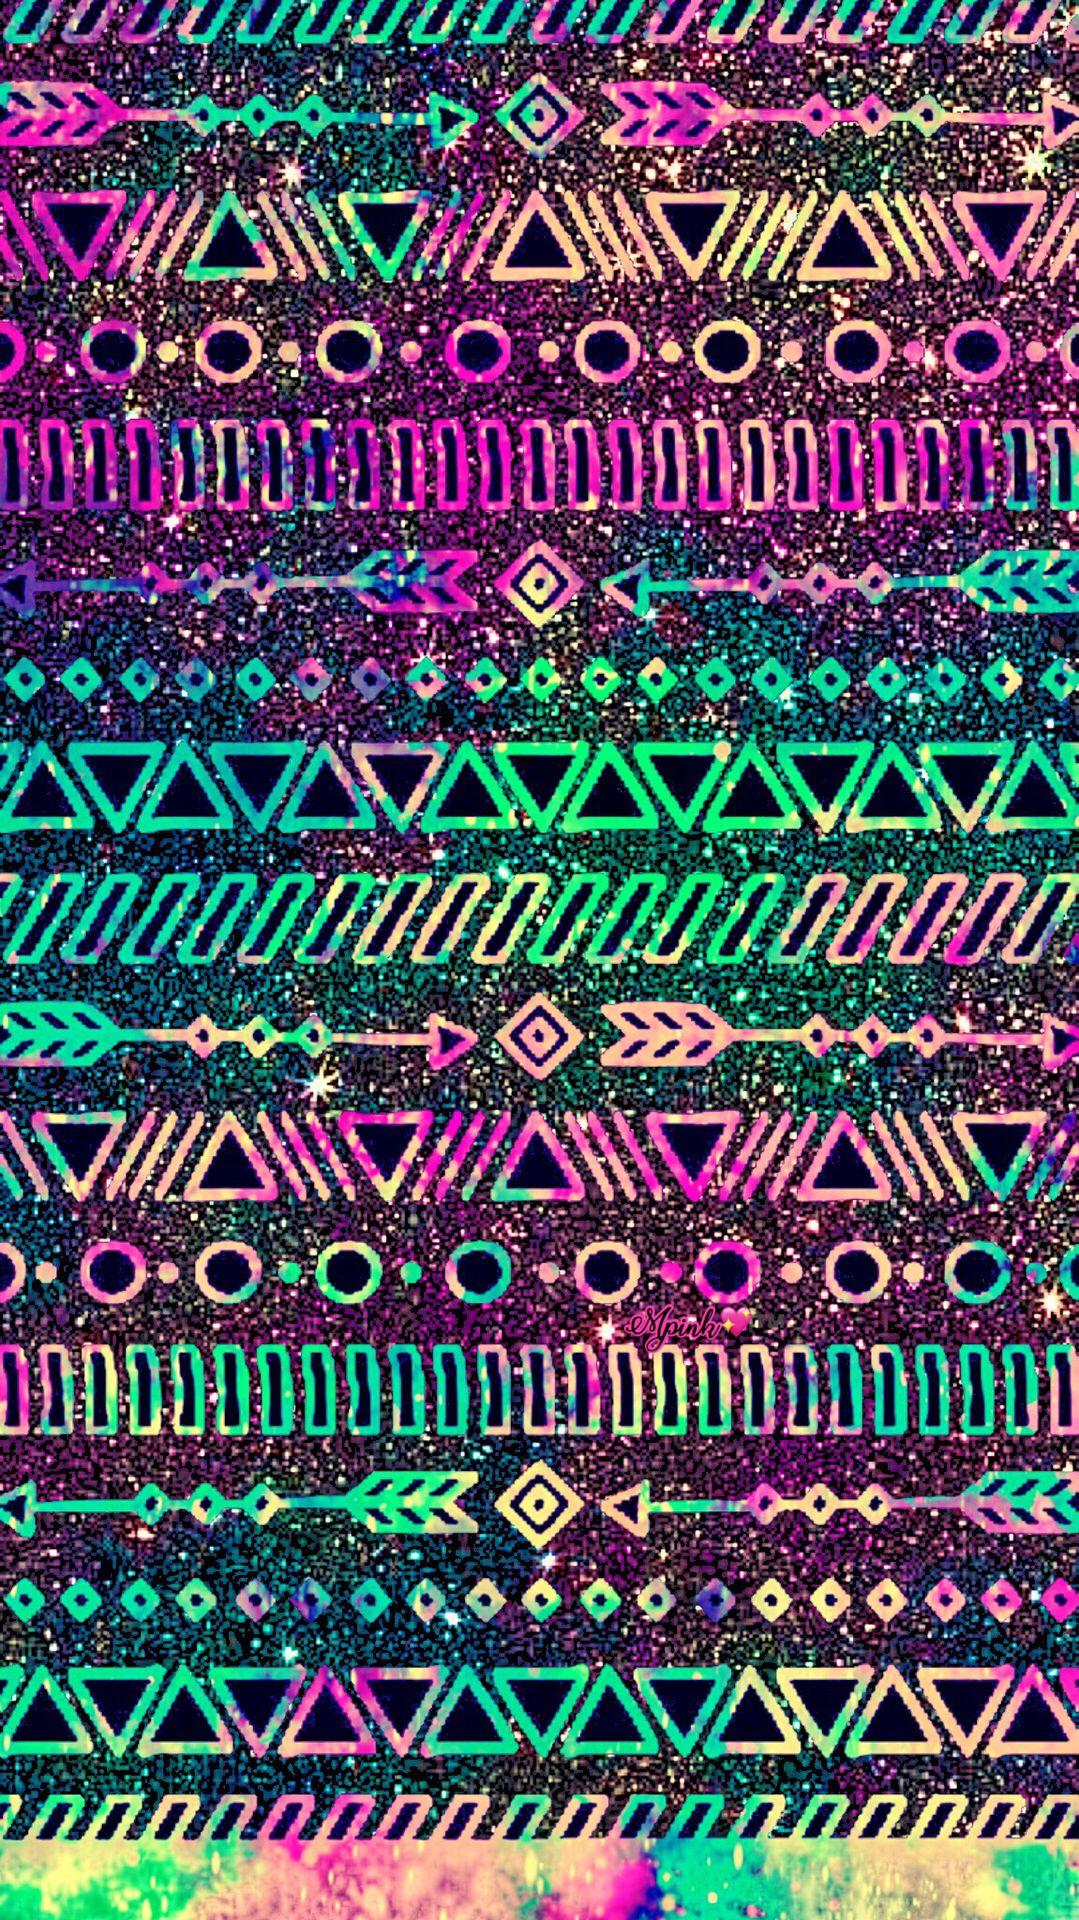 Neon Tribal Wallpaper Androidwallpaper Iphonewallpaper Wallpaper Galaxy Sparkle Glitter Tribal Wallpaper Tribal Print Wallpaper Cute Wallpaper For Phone